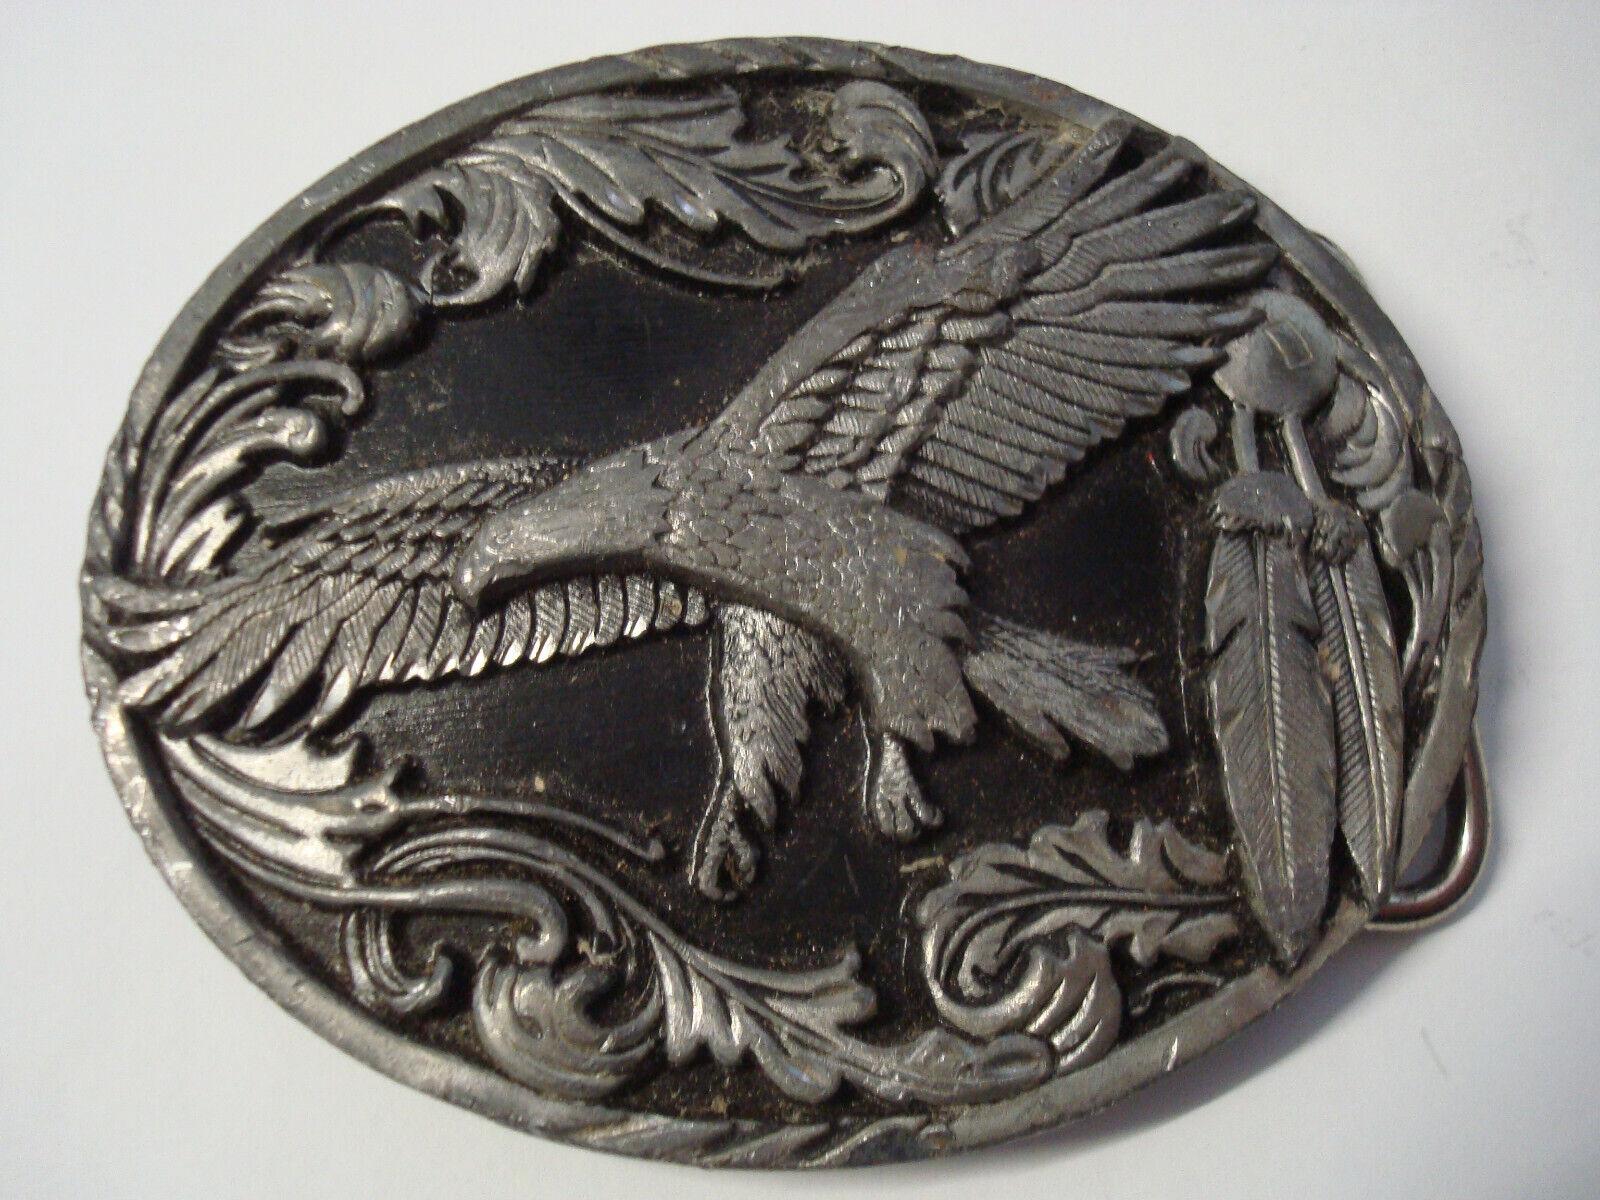 Siskiyou Gürtelschnalle; USA 1995; Buckle; Adler; Eagle